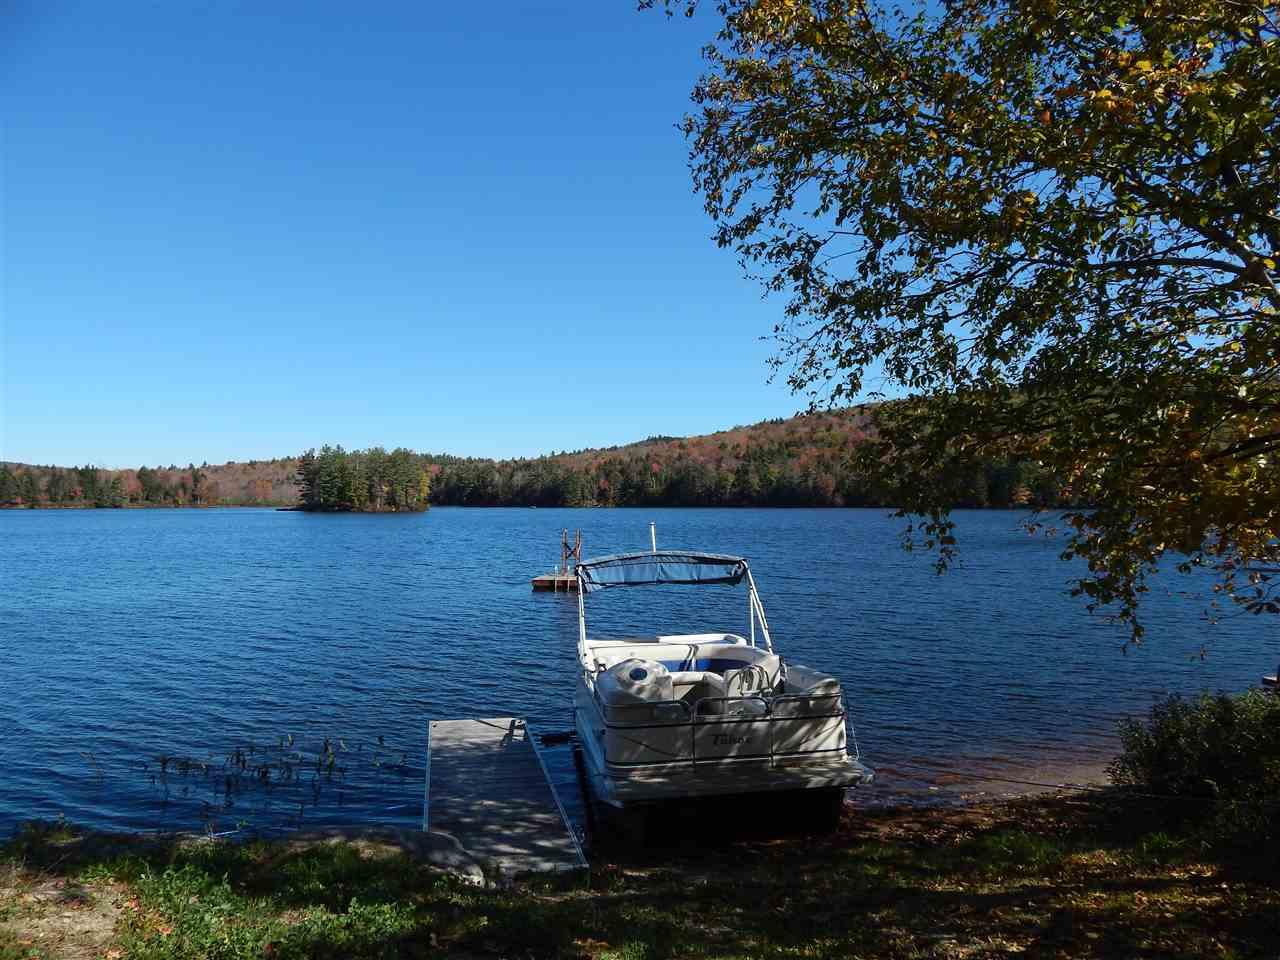 Baptist Pond